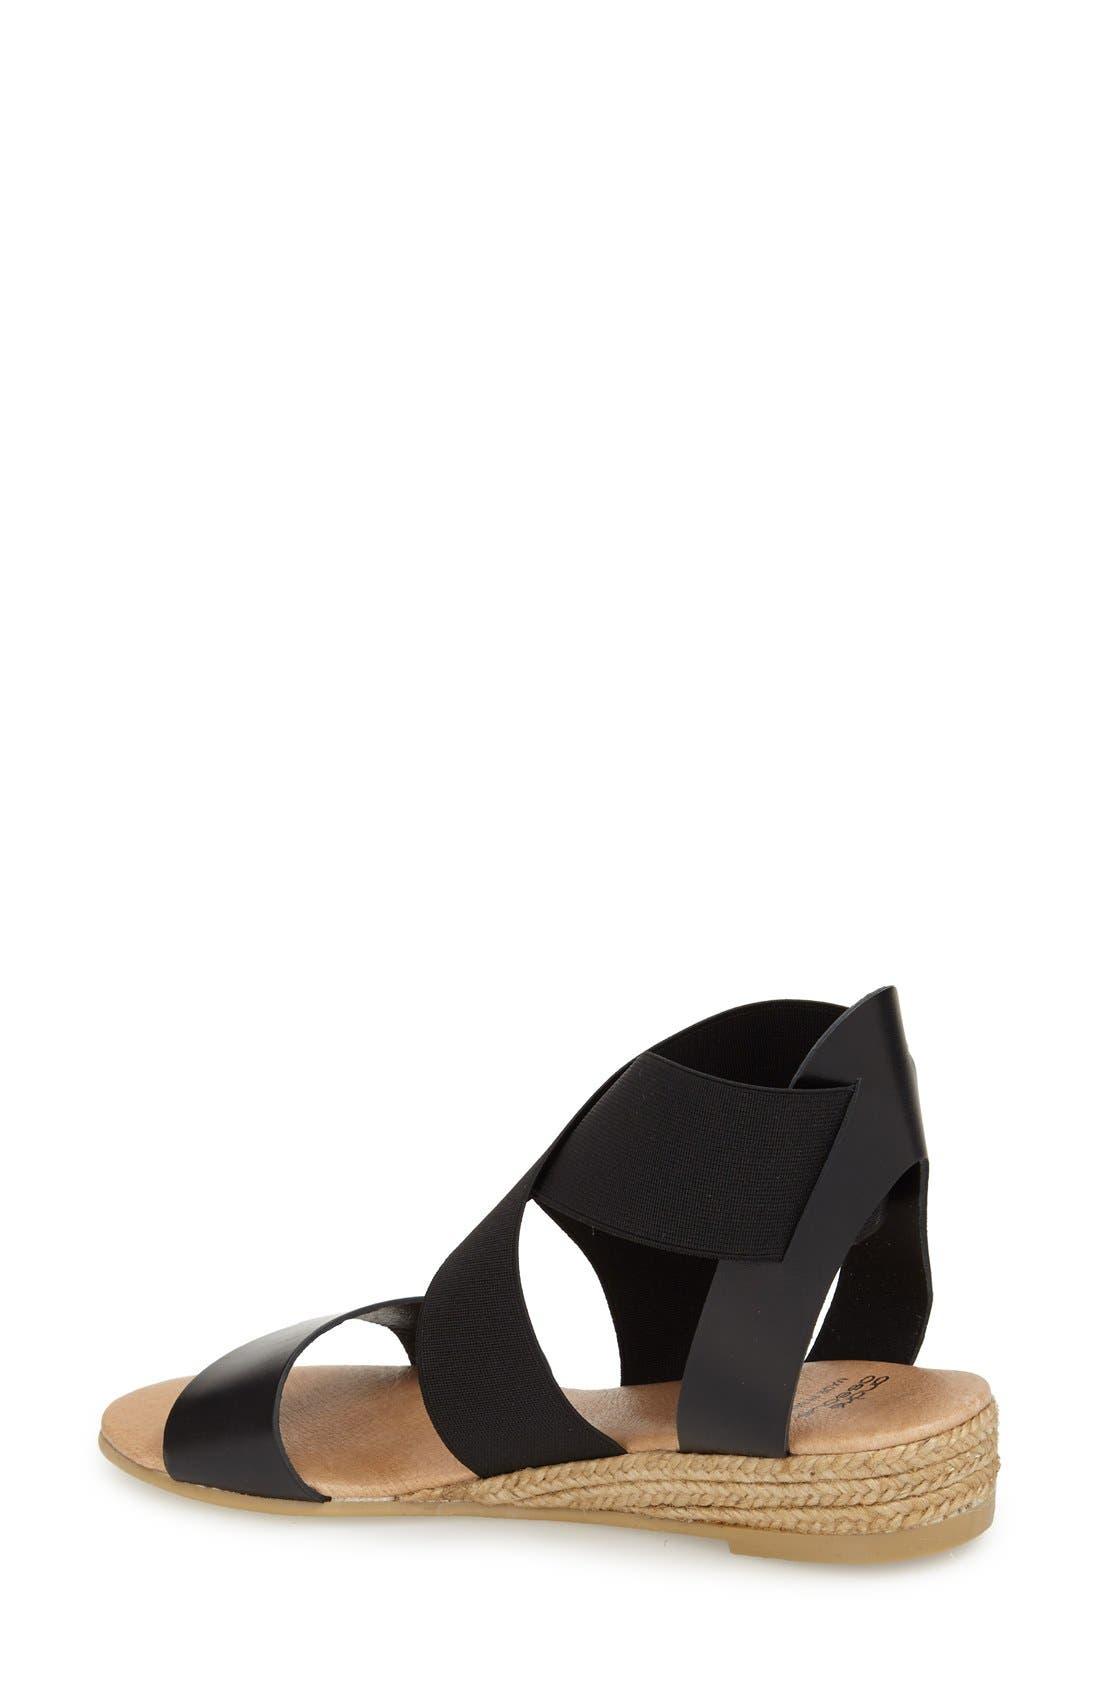 Alternate Image 2  - André Assous 'Malta' Wedge Espadrille Sandal (Women)